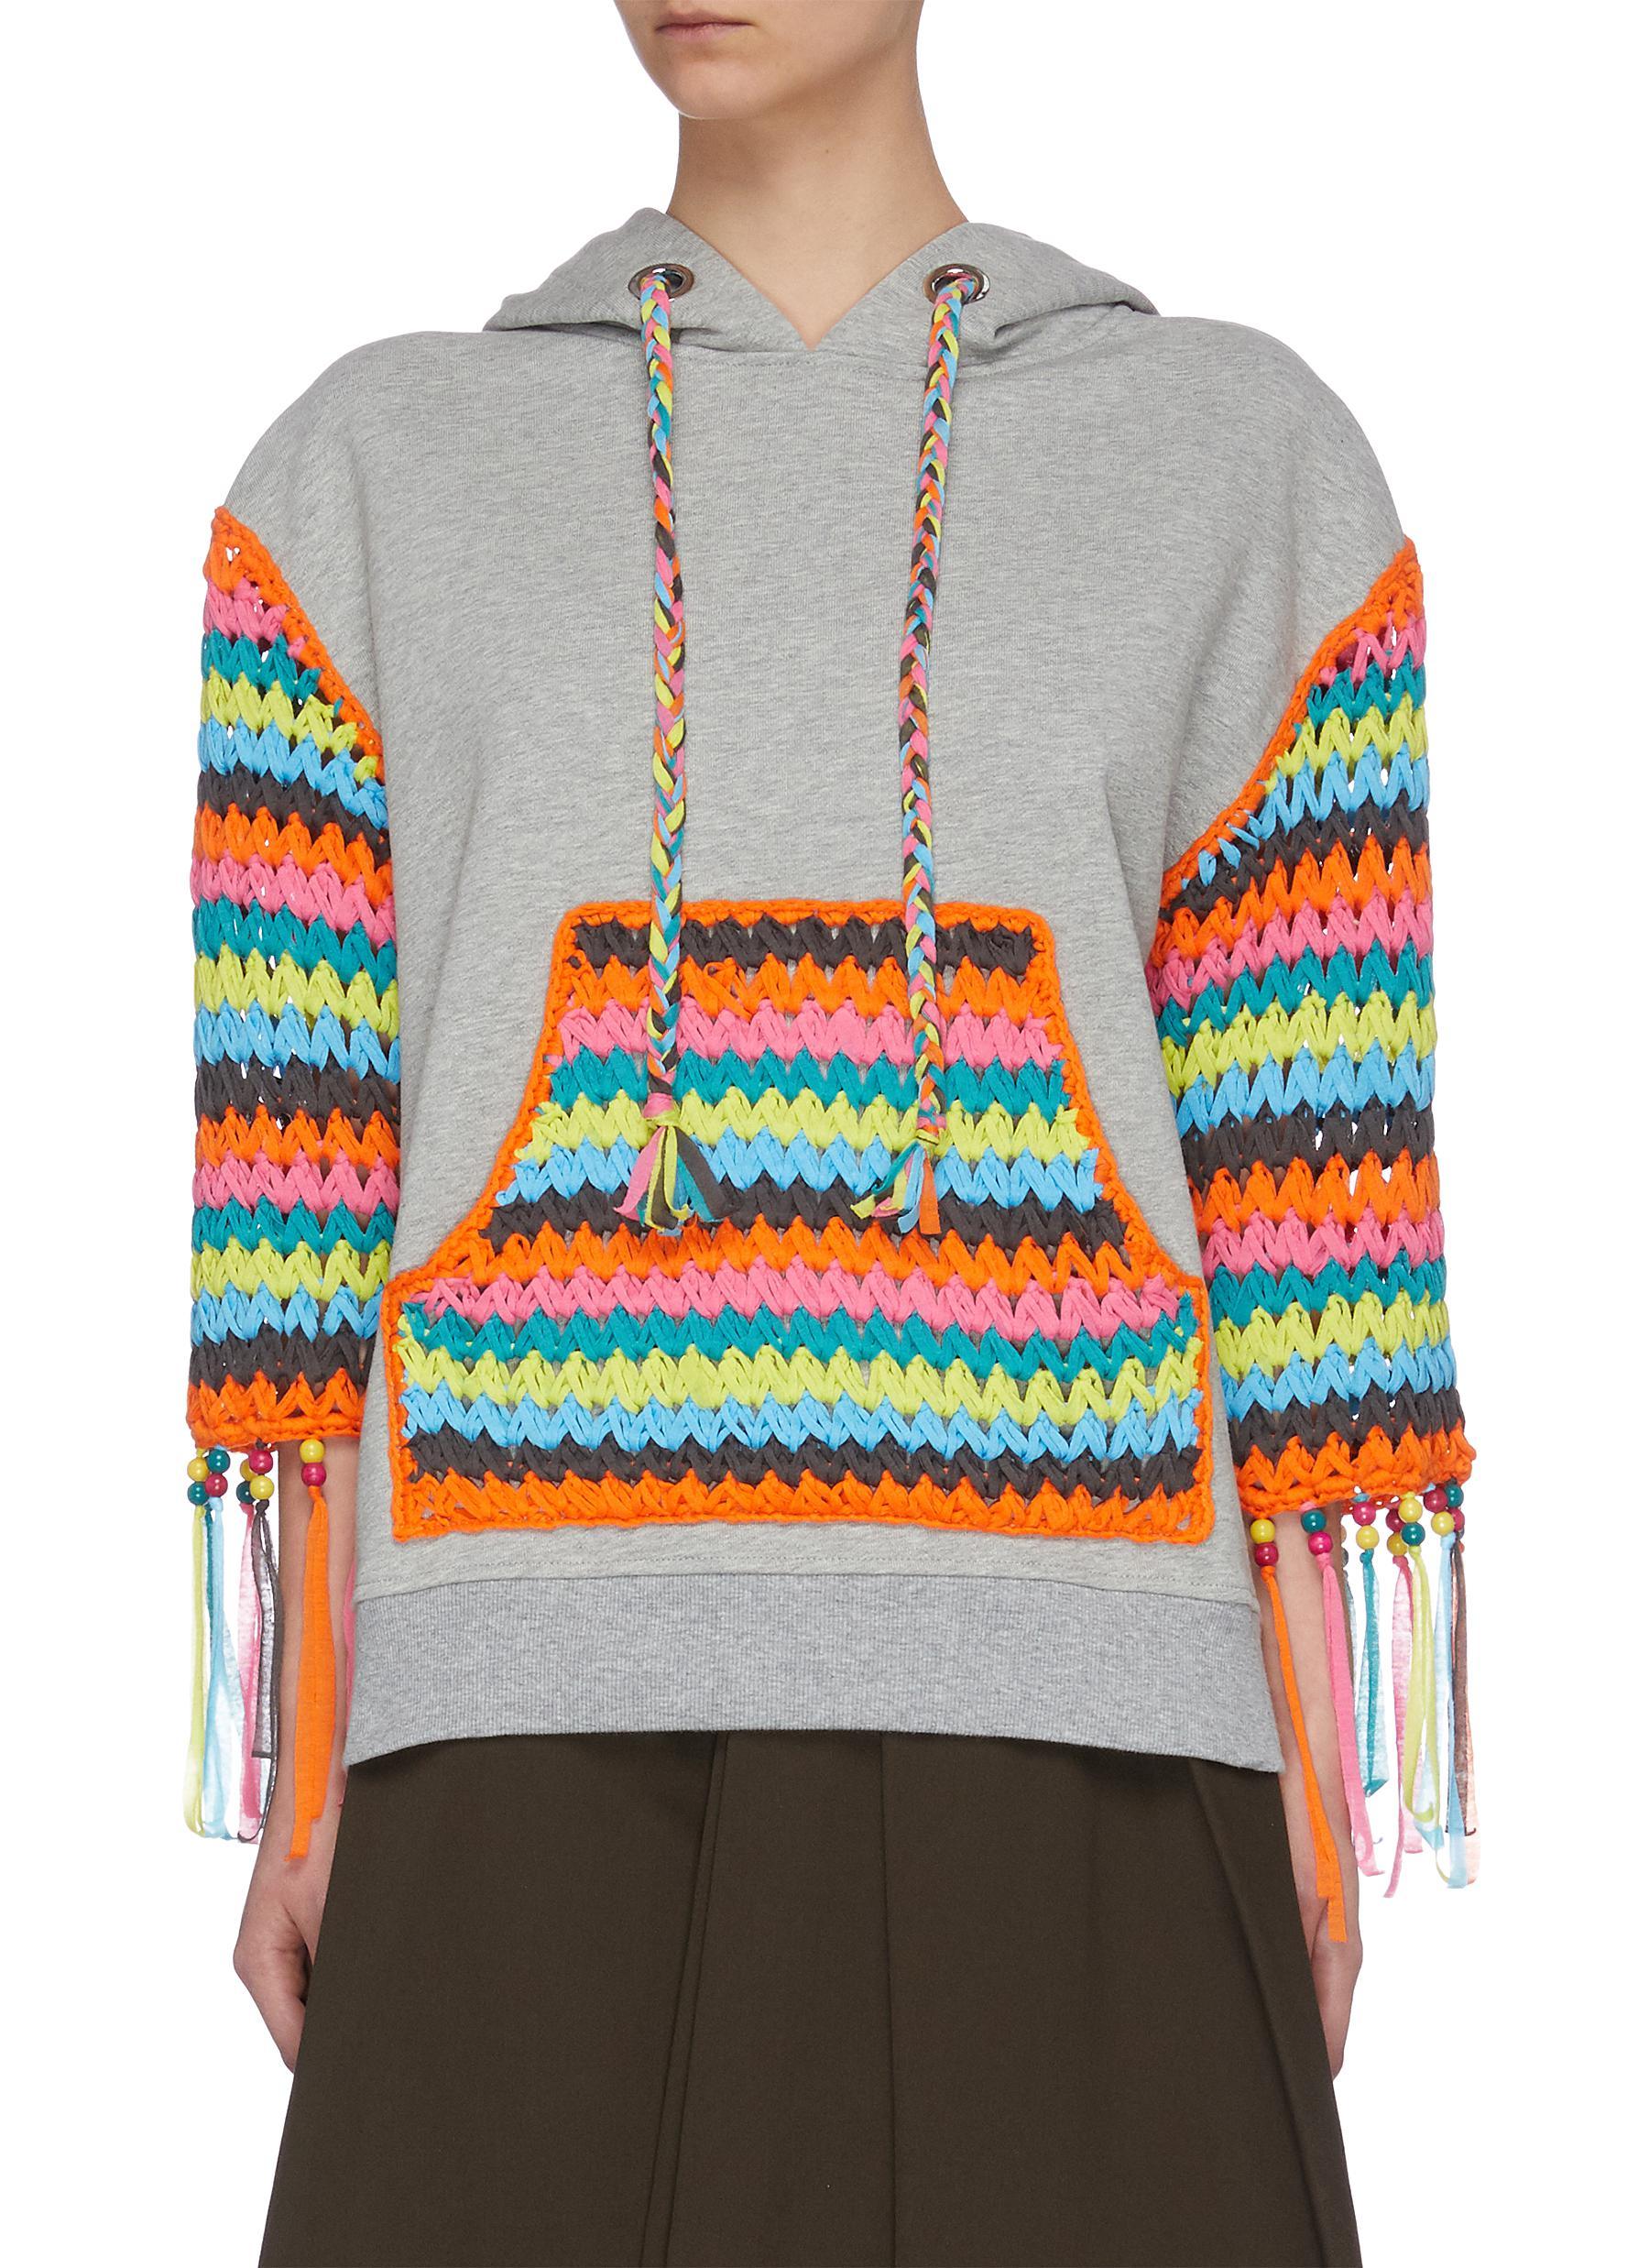 Buy Mira Mikati Tops 'Sunshine' hand knit panel hoodie